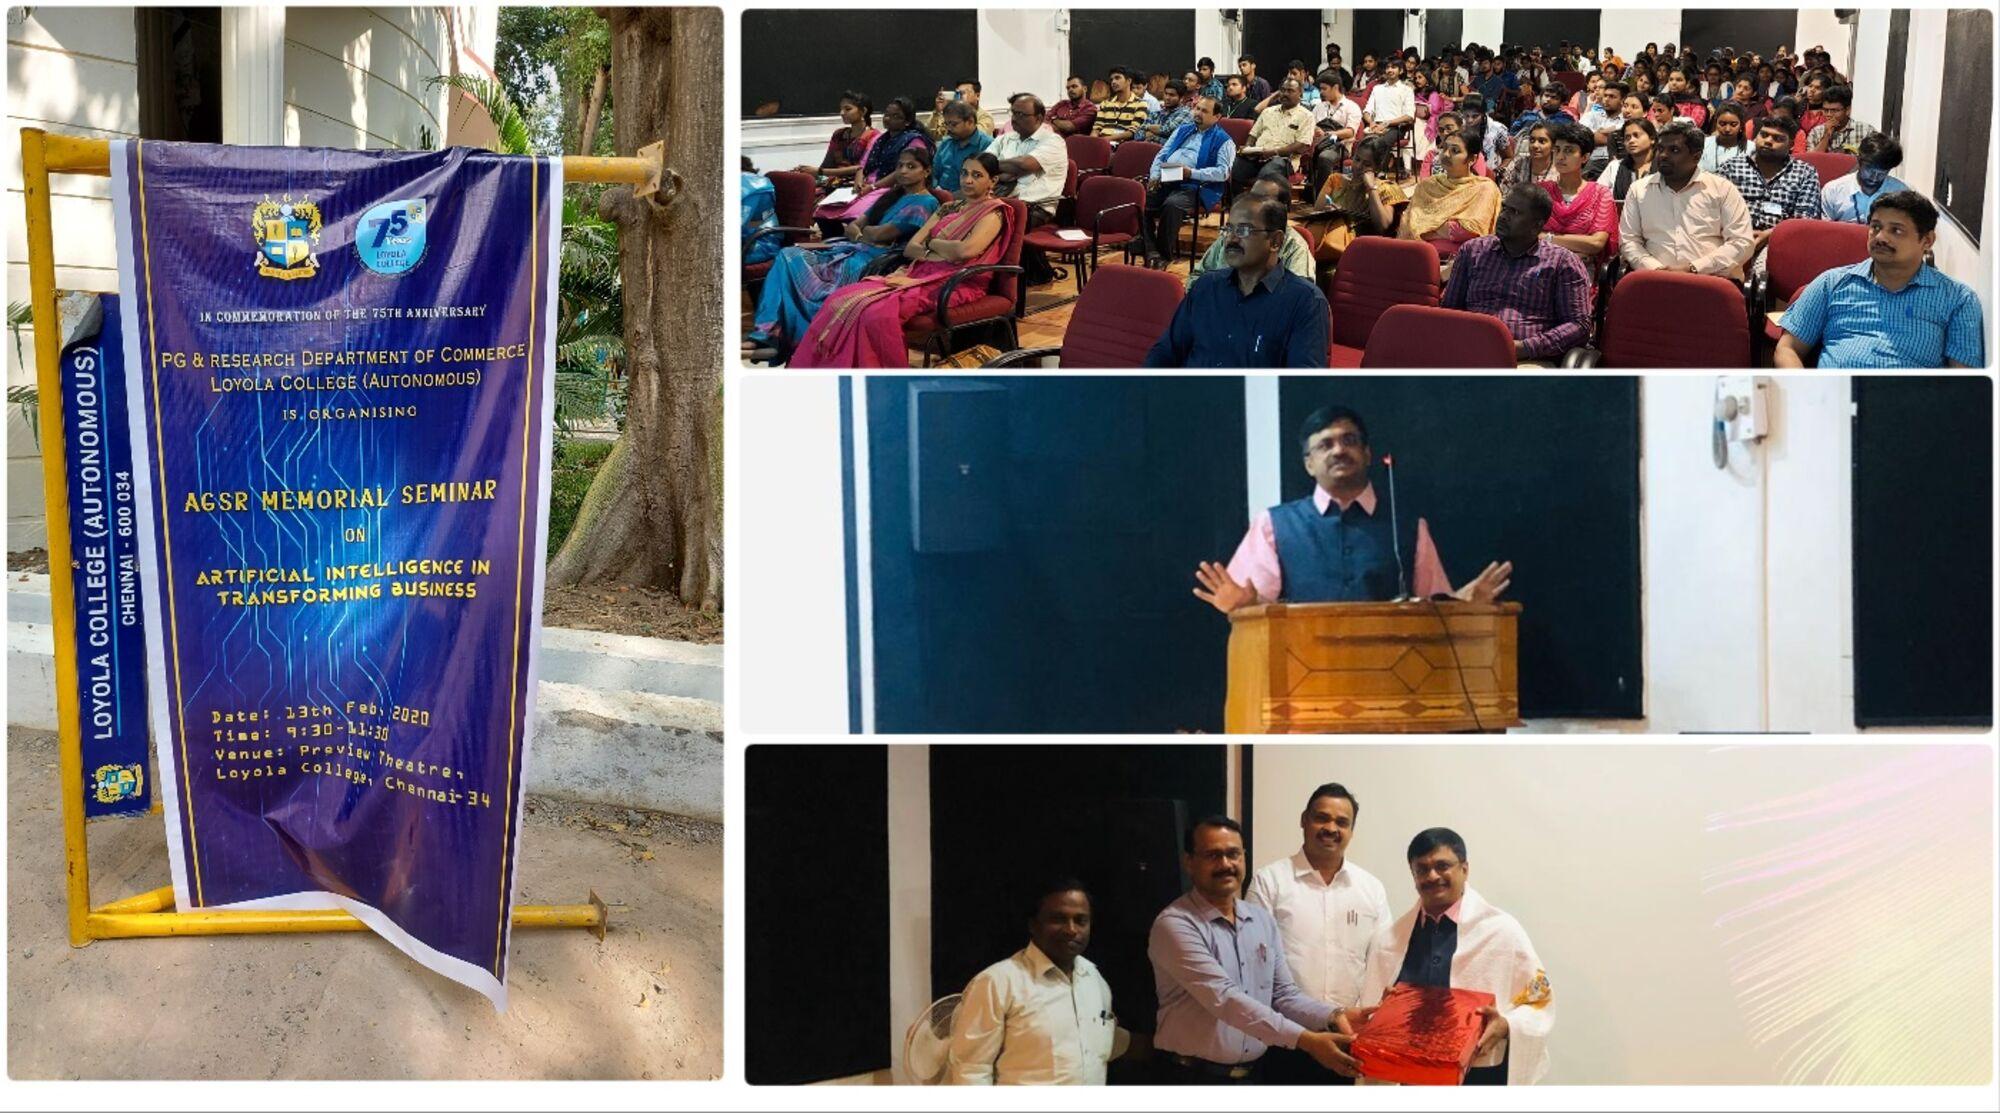 Prof A G Soundara Rajan Memorial Seminar - Artificial Intelligence by Venkatarangan